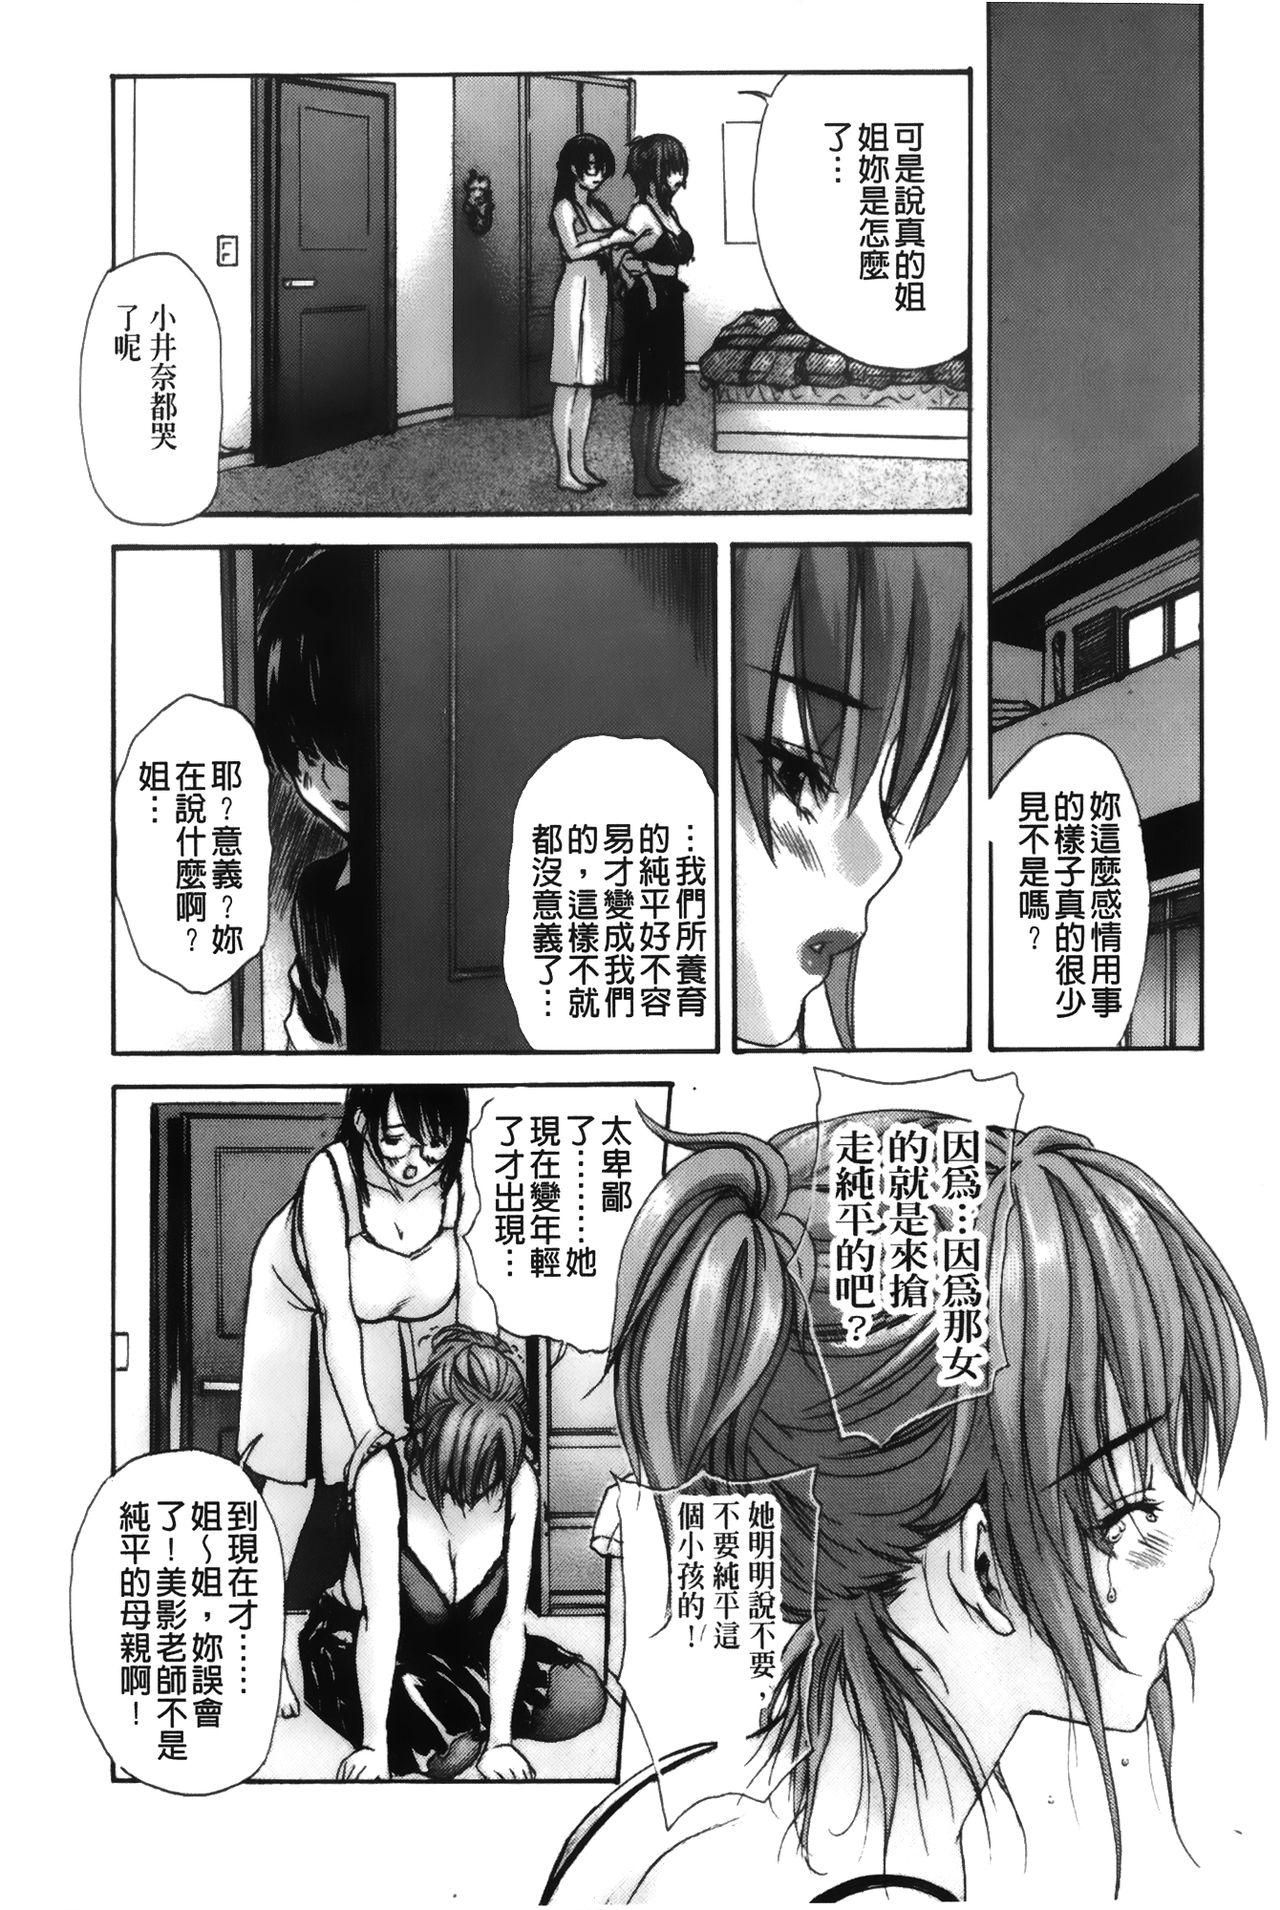 Tonari no Minano Sensei 4 | 隔壁的美奈乃老師 4 175